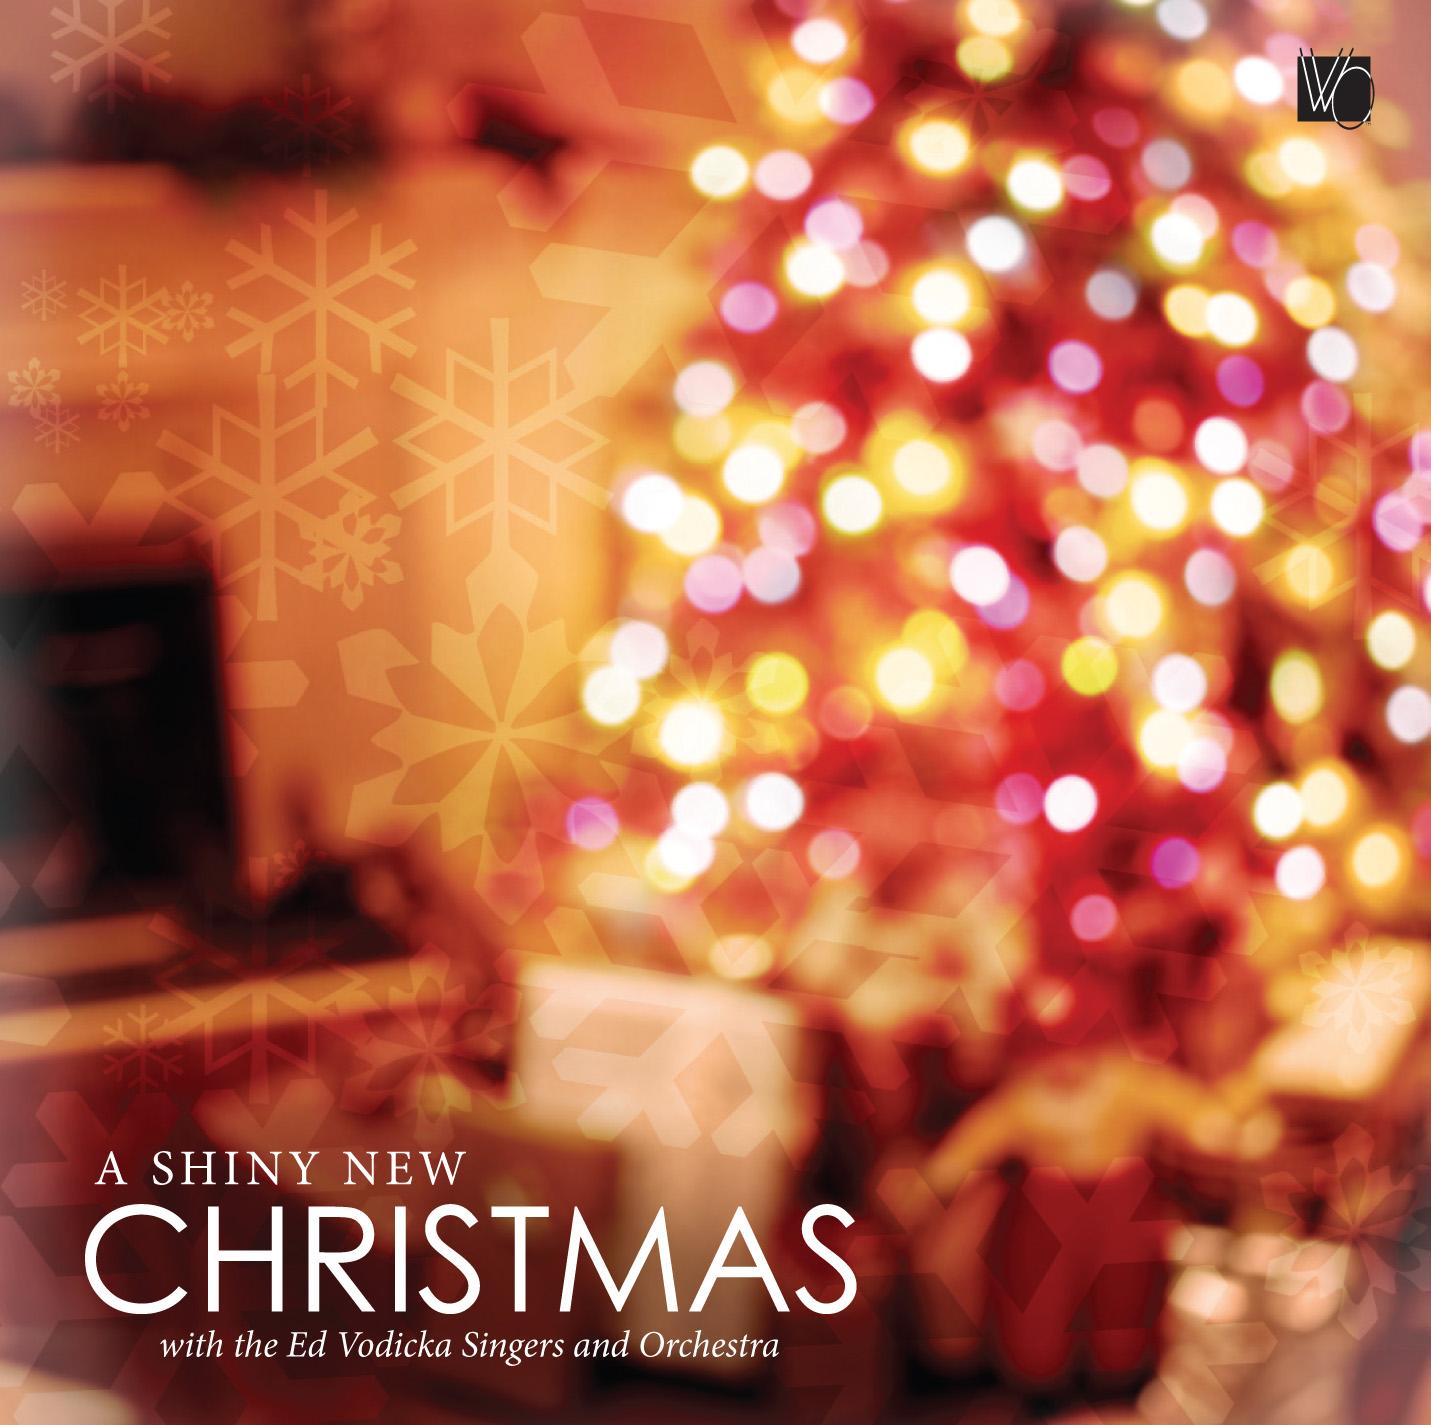 A Shiny New Christmas